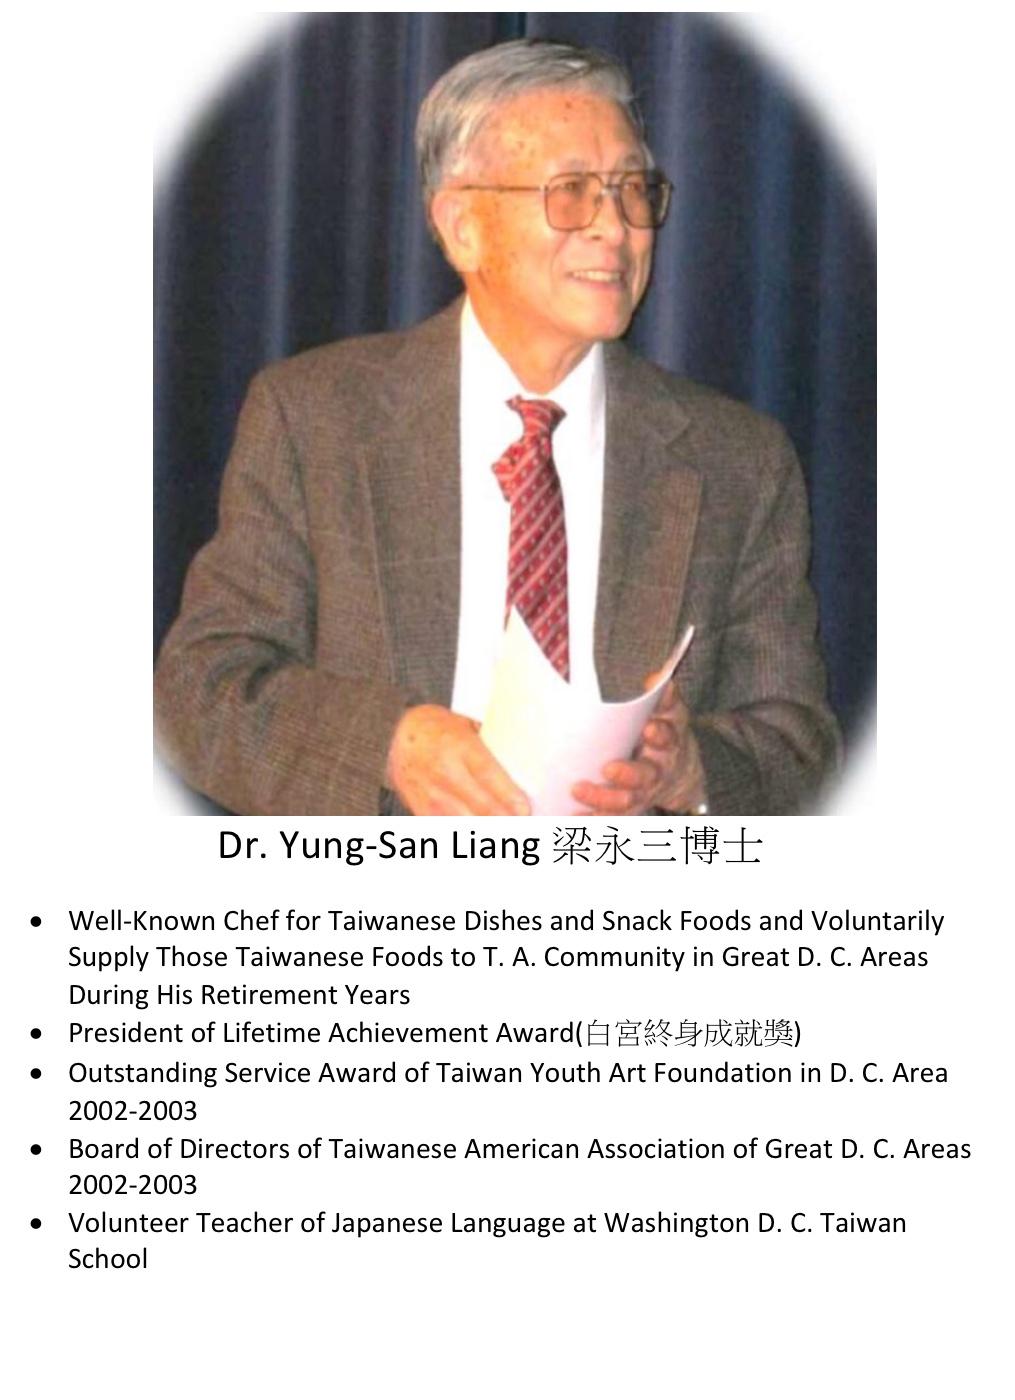 254. Dr. Yung-San Liang 梁永三博士